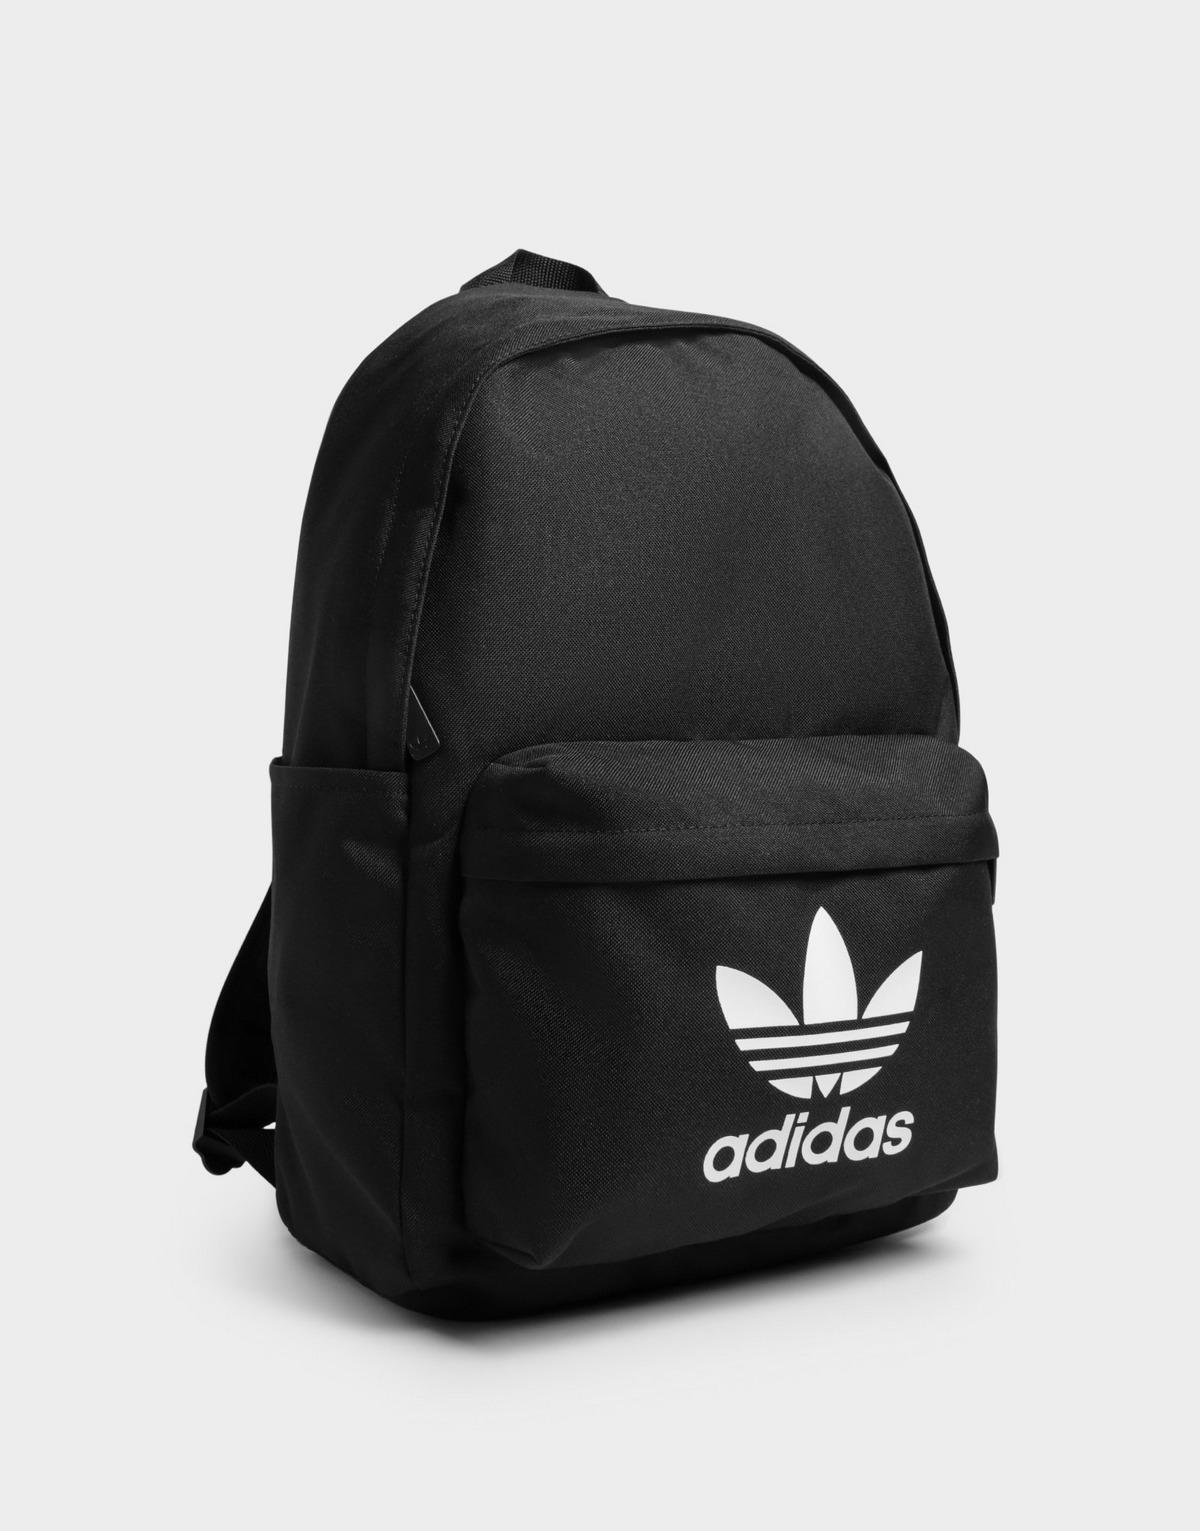 Christmas Gifts for Men | adidas Originals Trefoil Classic Backpack | Beanstalk Mums